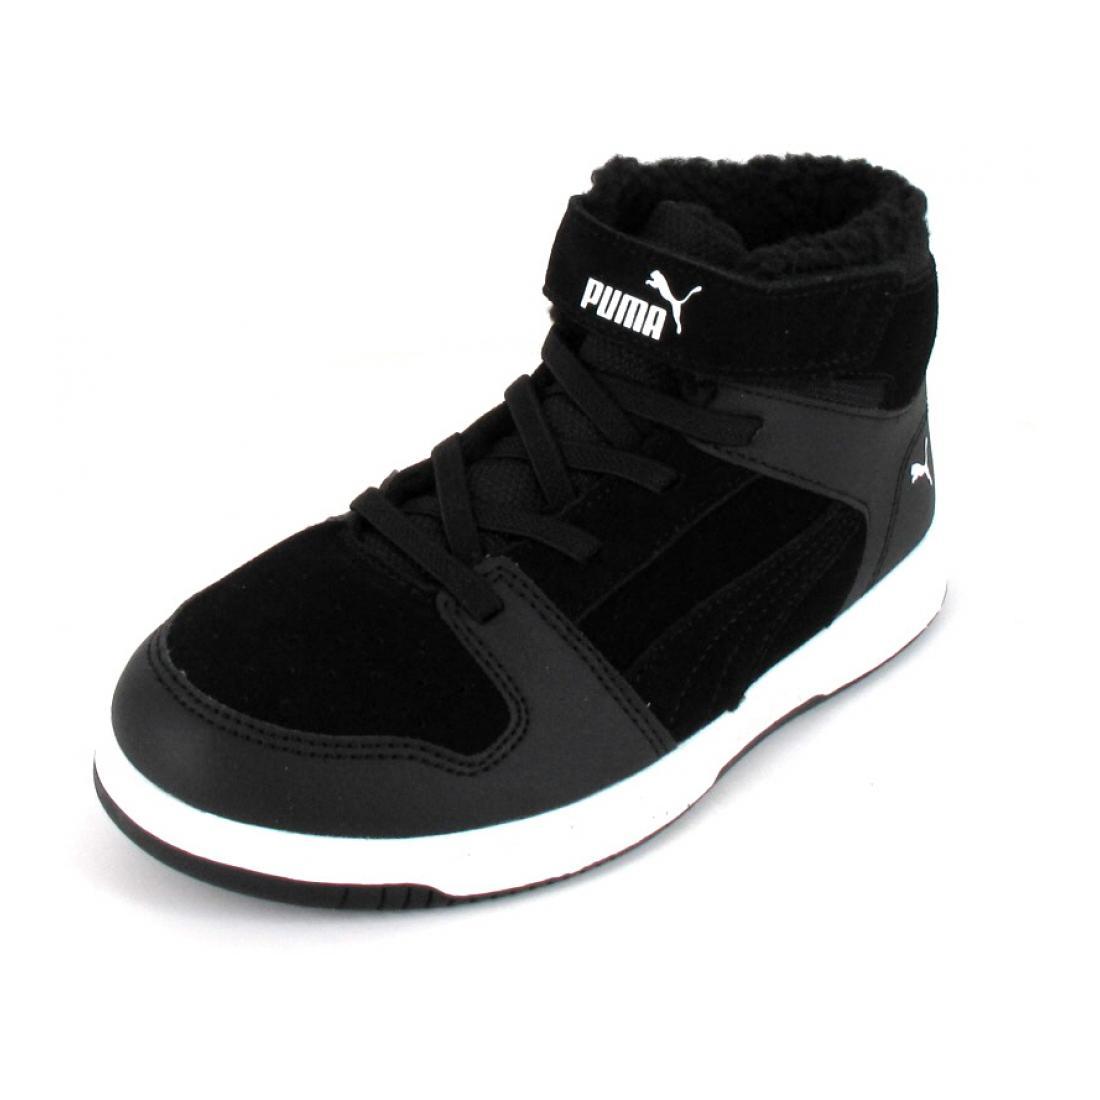 Puma Sneaker high Rebound Layup Fur SD V P